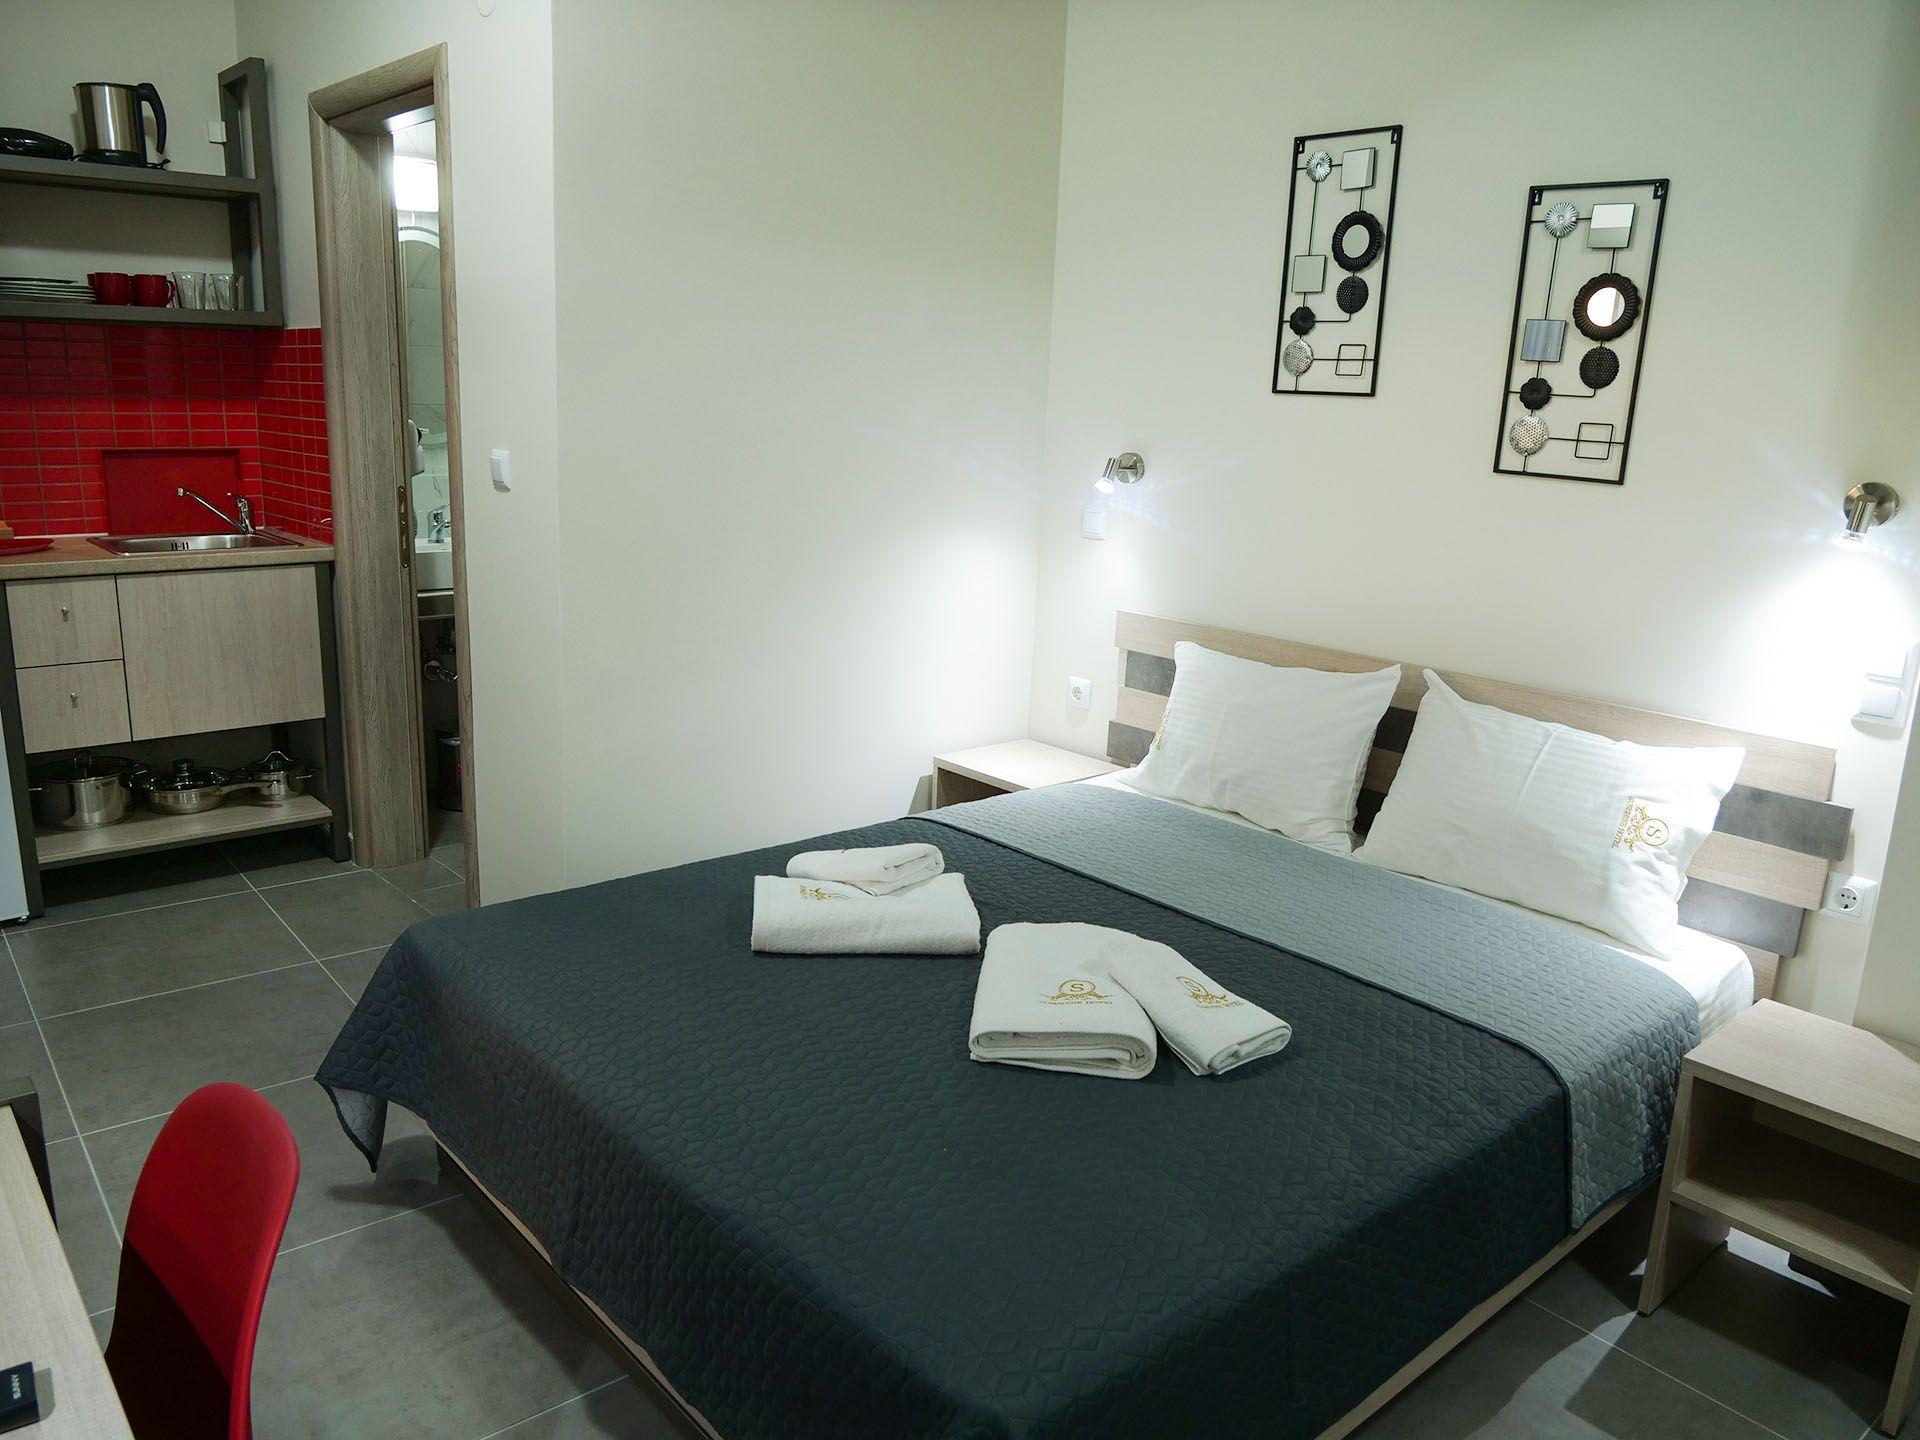 Sunshine Apartments - Σιθωνία, Χαλκιδική ✦ 3 Ημέρες (2 Διανυκτερεύσεις) ✦ 3 άτομα ✦ Χωρίς Πρωινό ✦ έως 17/06/2021 ✦ Υπέροχη Τοποθεσία!